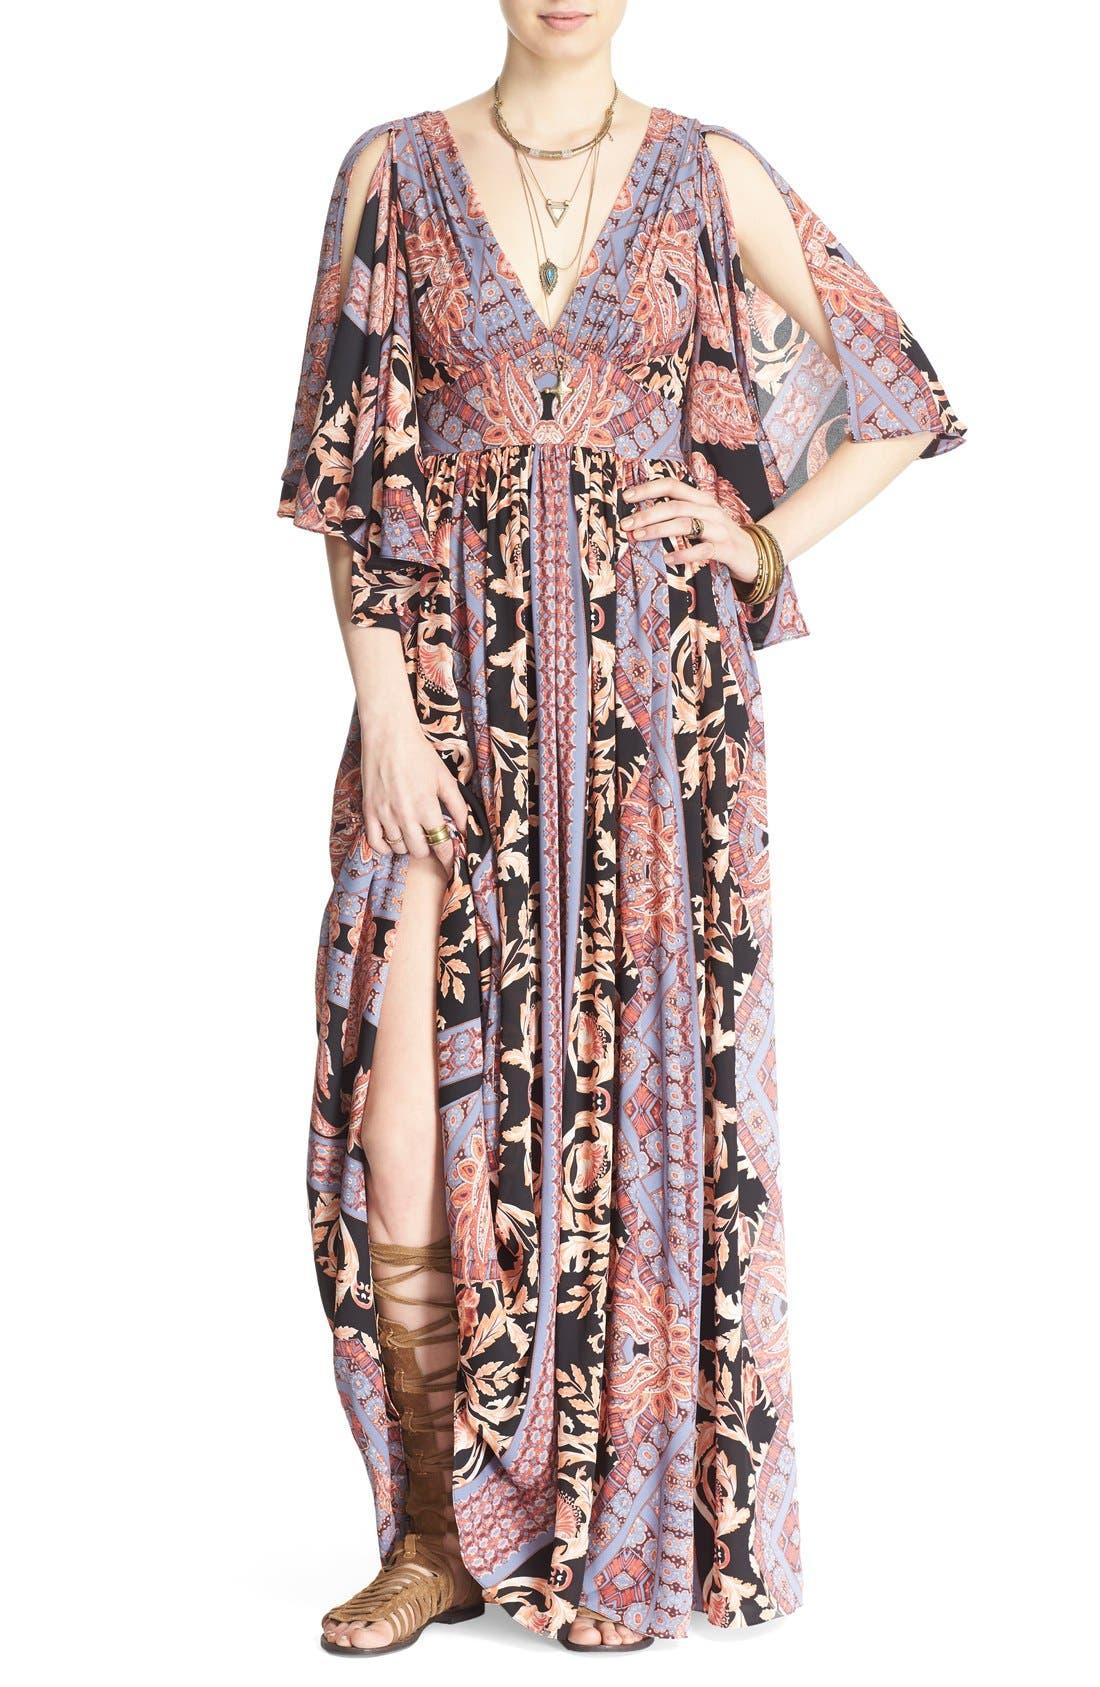 Alternate Image 1 Selected - Free People 'Fern' Print Maxi Dress